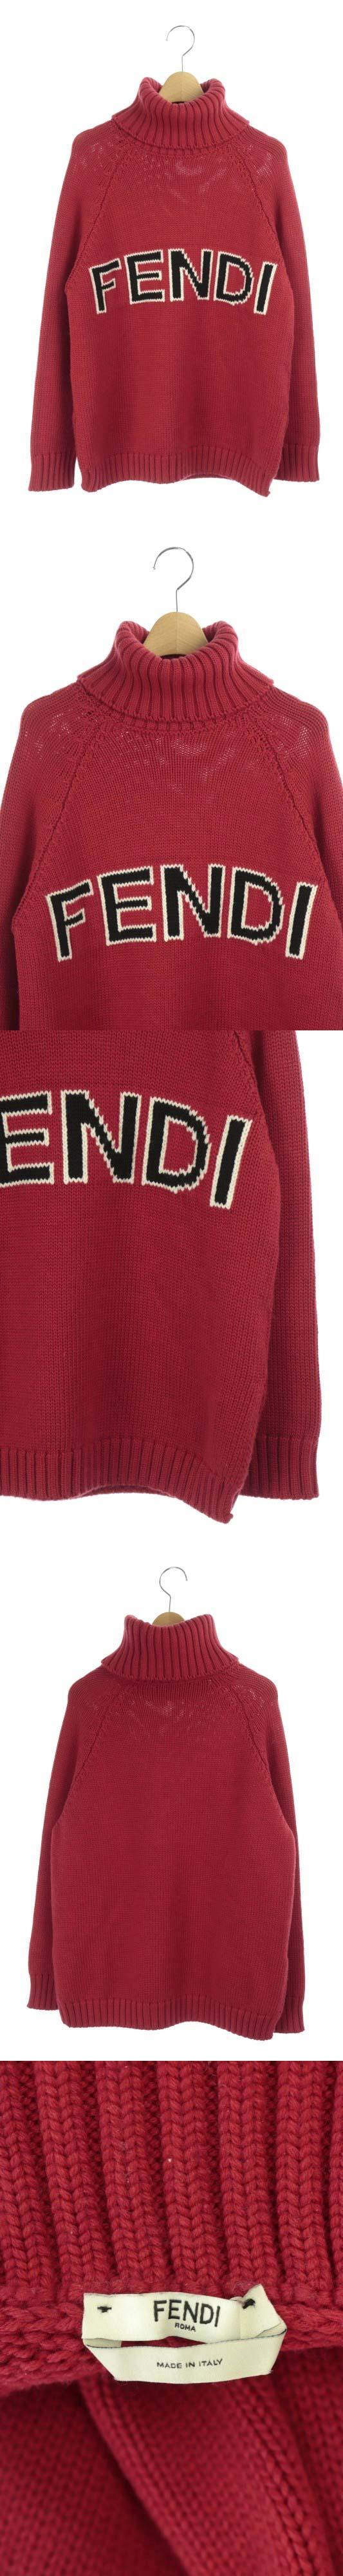 18AW ニット セーター タートルネック 長袖 36 赤 /DF ■OS